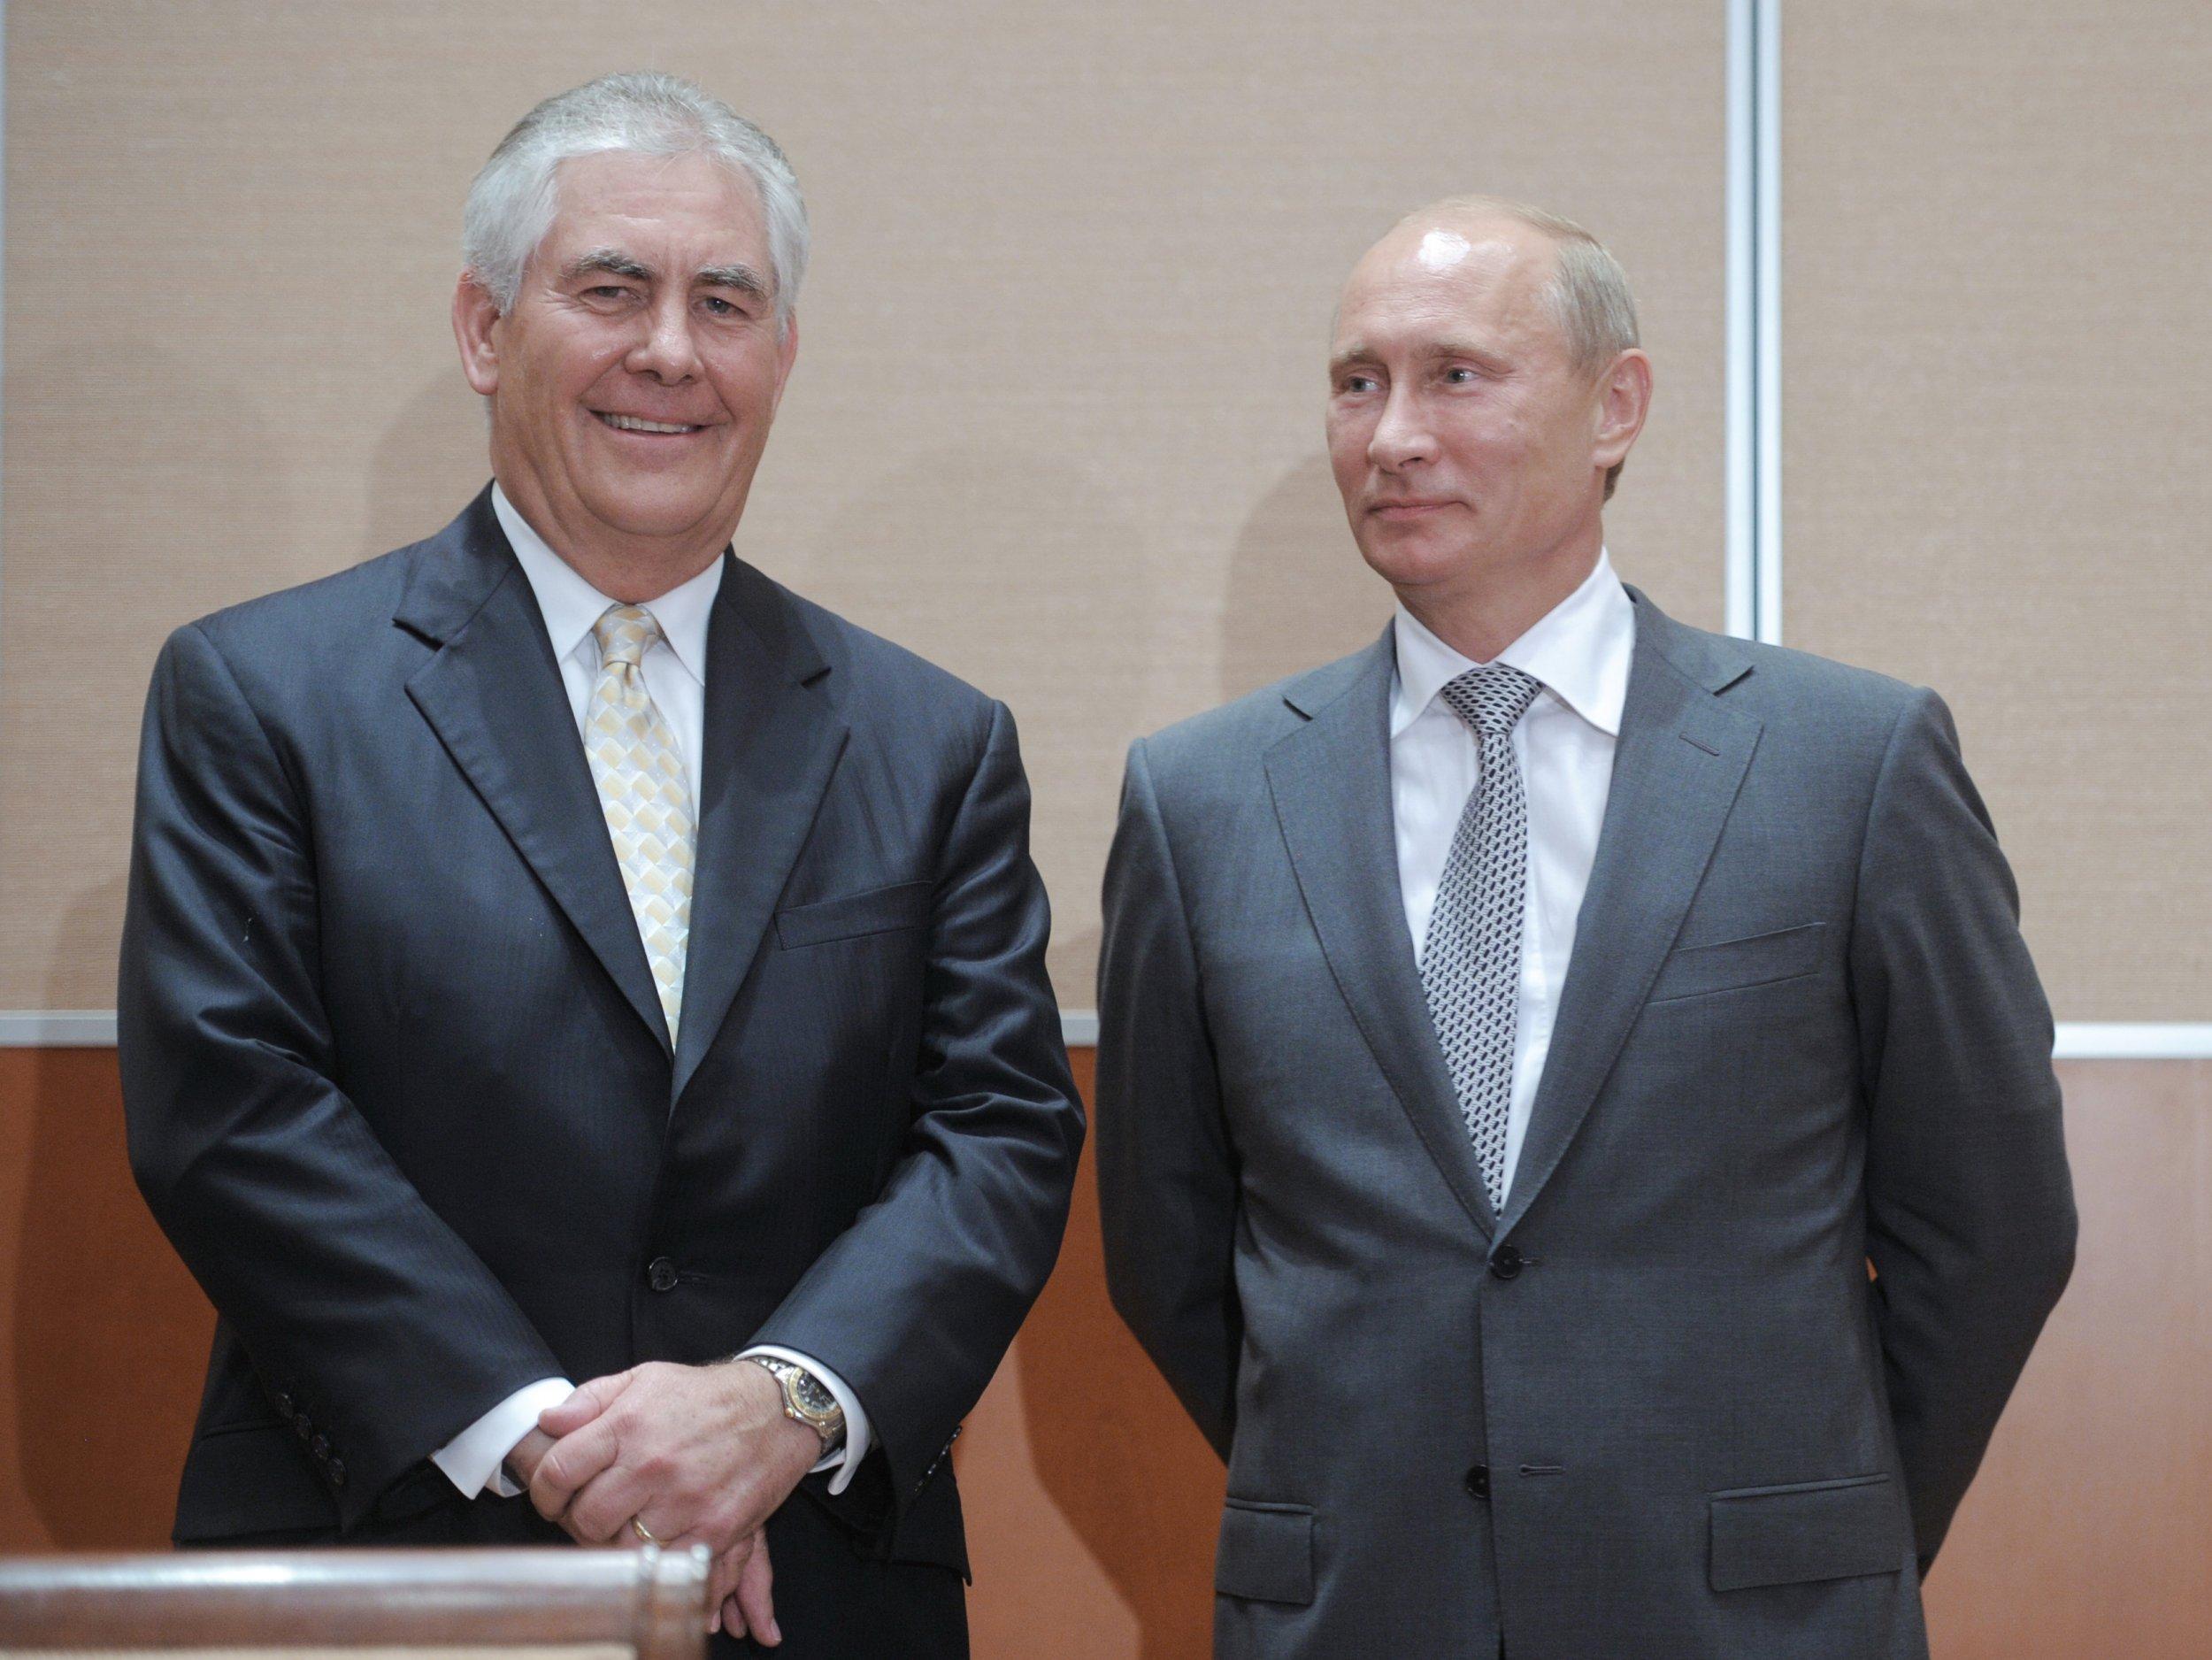 Tillerson and Putin